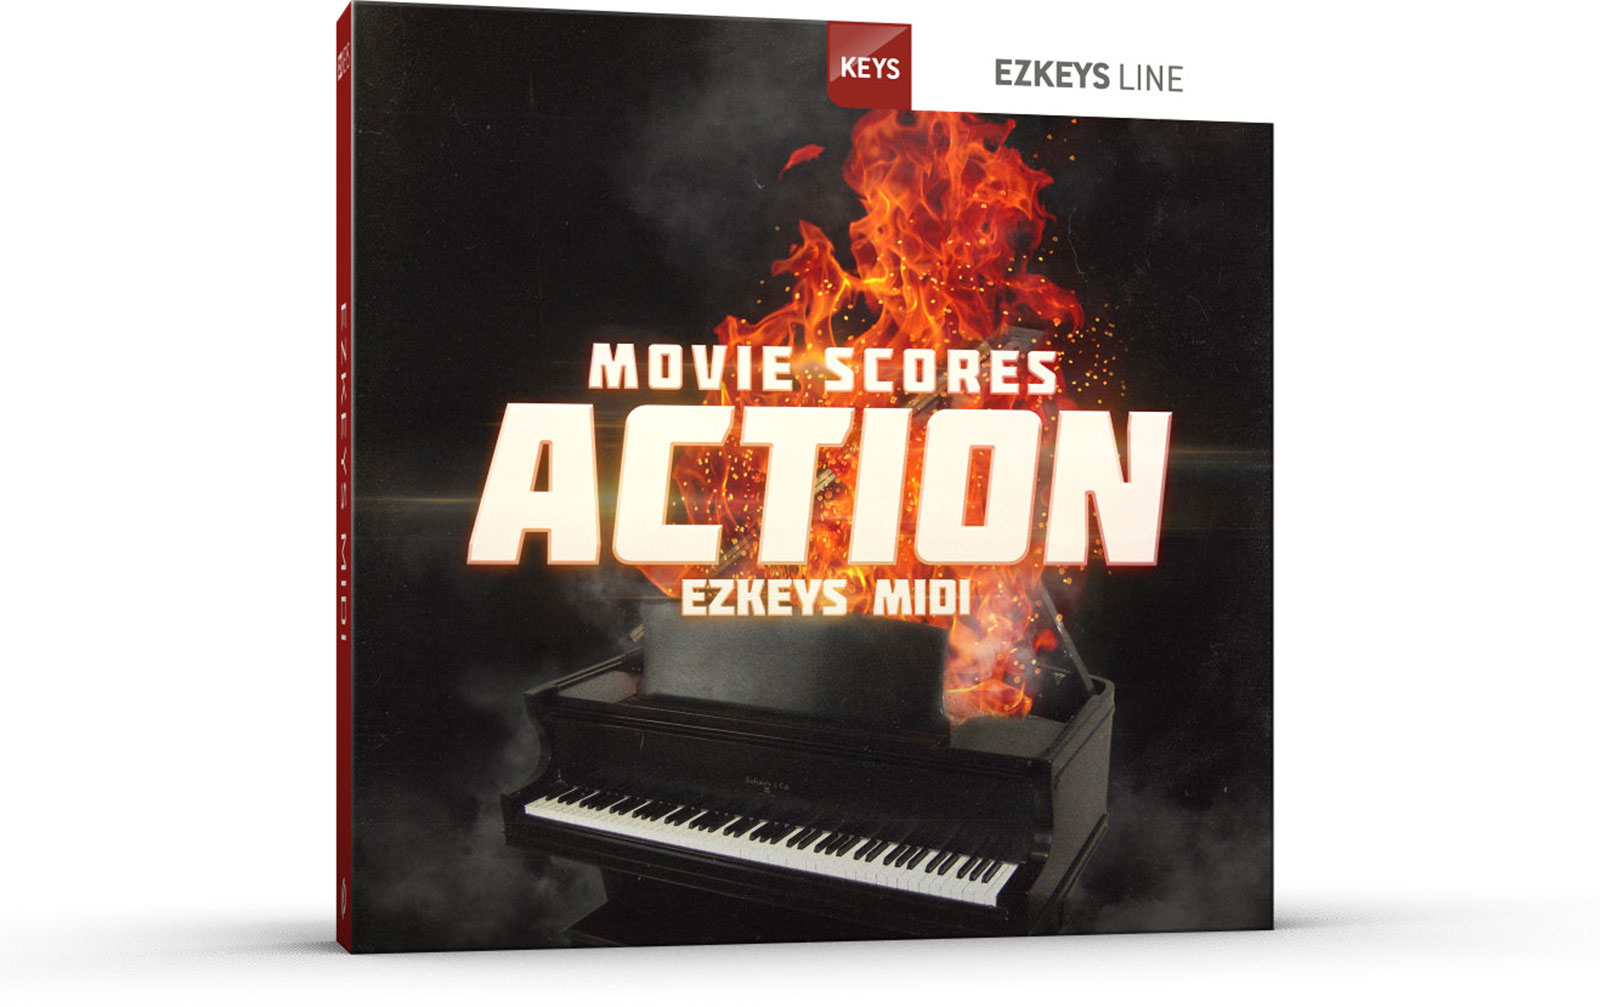 toontrack-ezkeys-movie-scores-action-midi-pack-download-